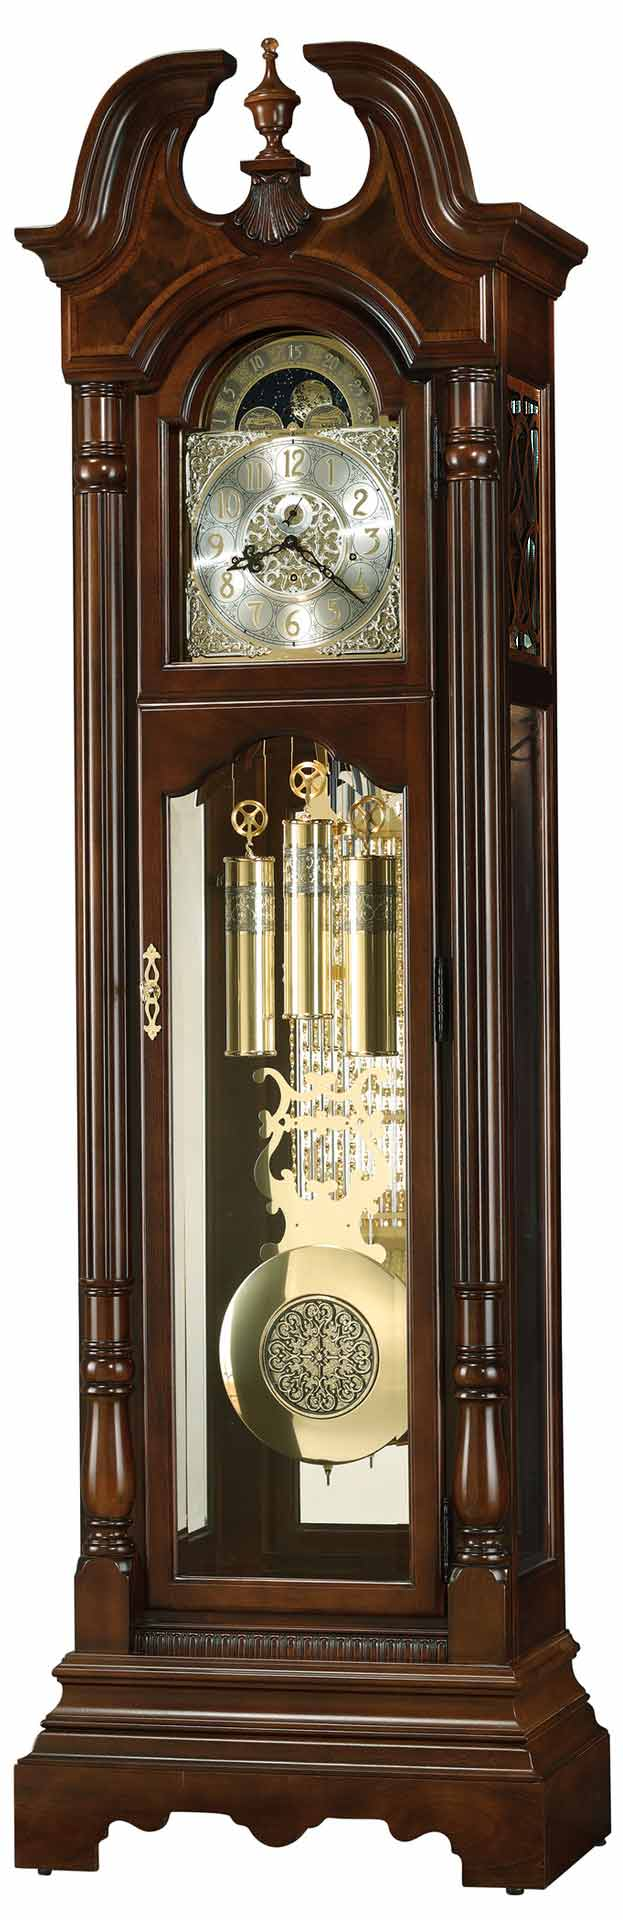 Howard Miller Brethren 611 260 Grandfather Clock The